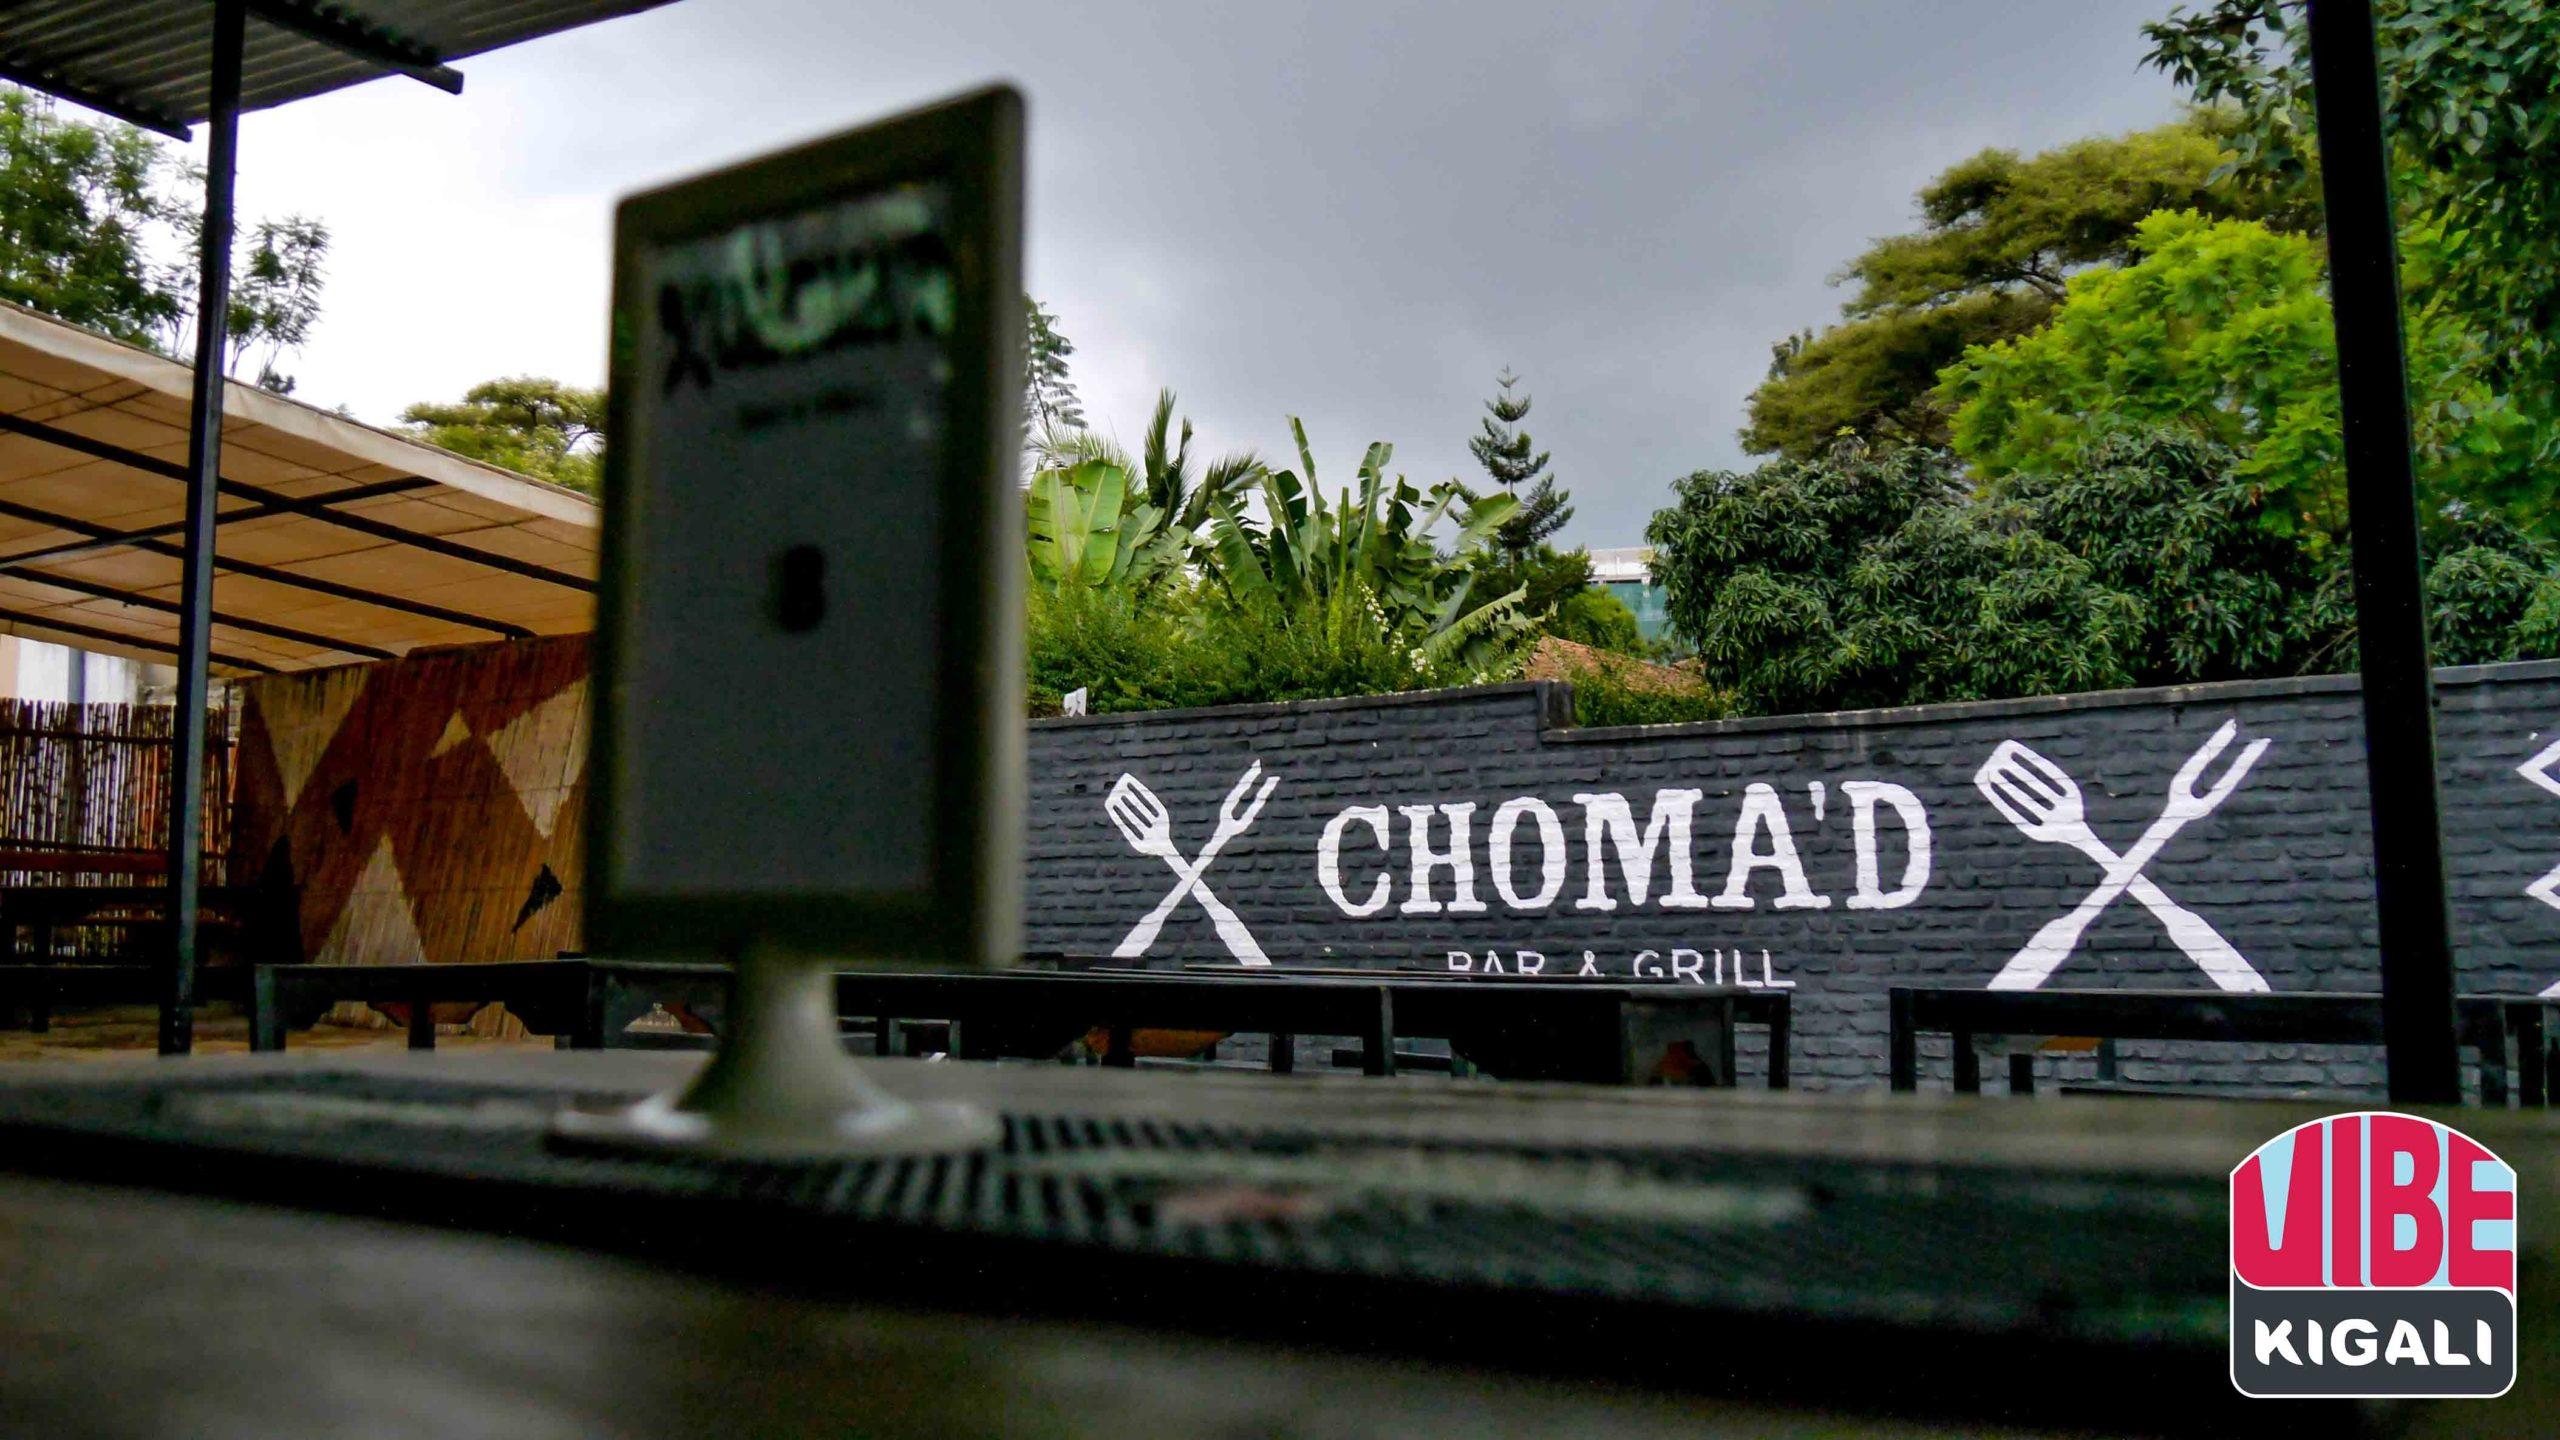 Chomad